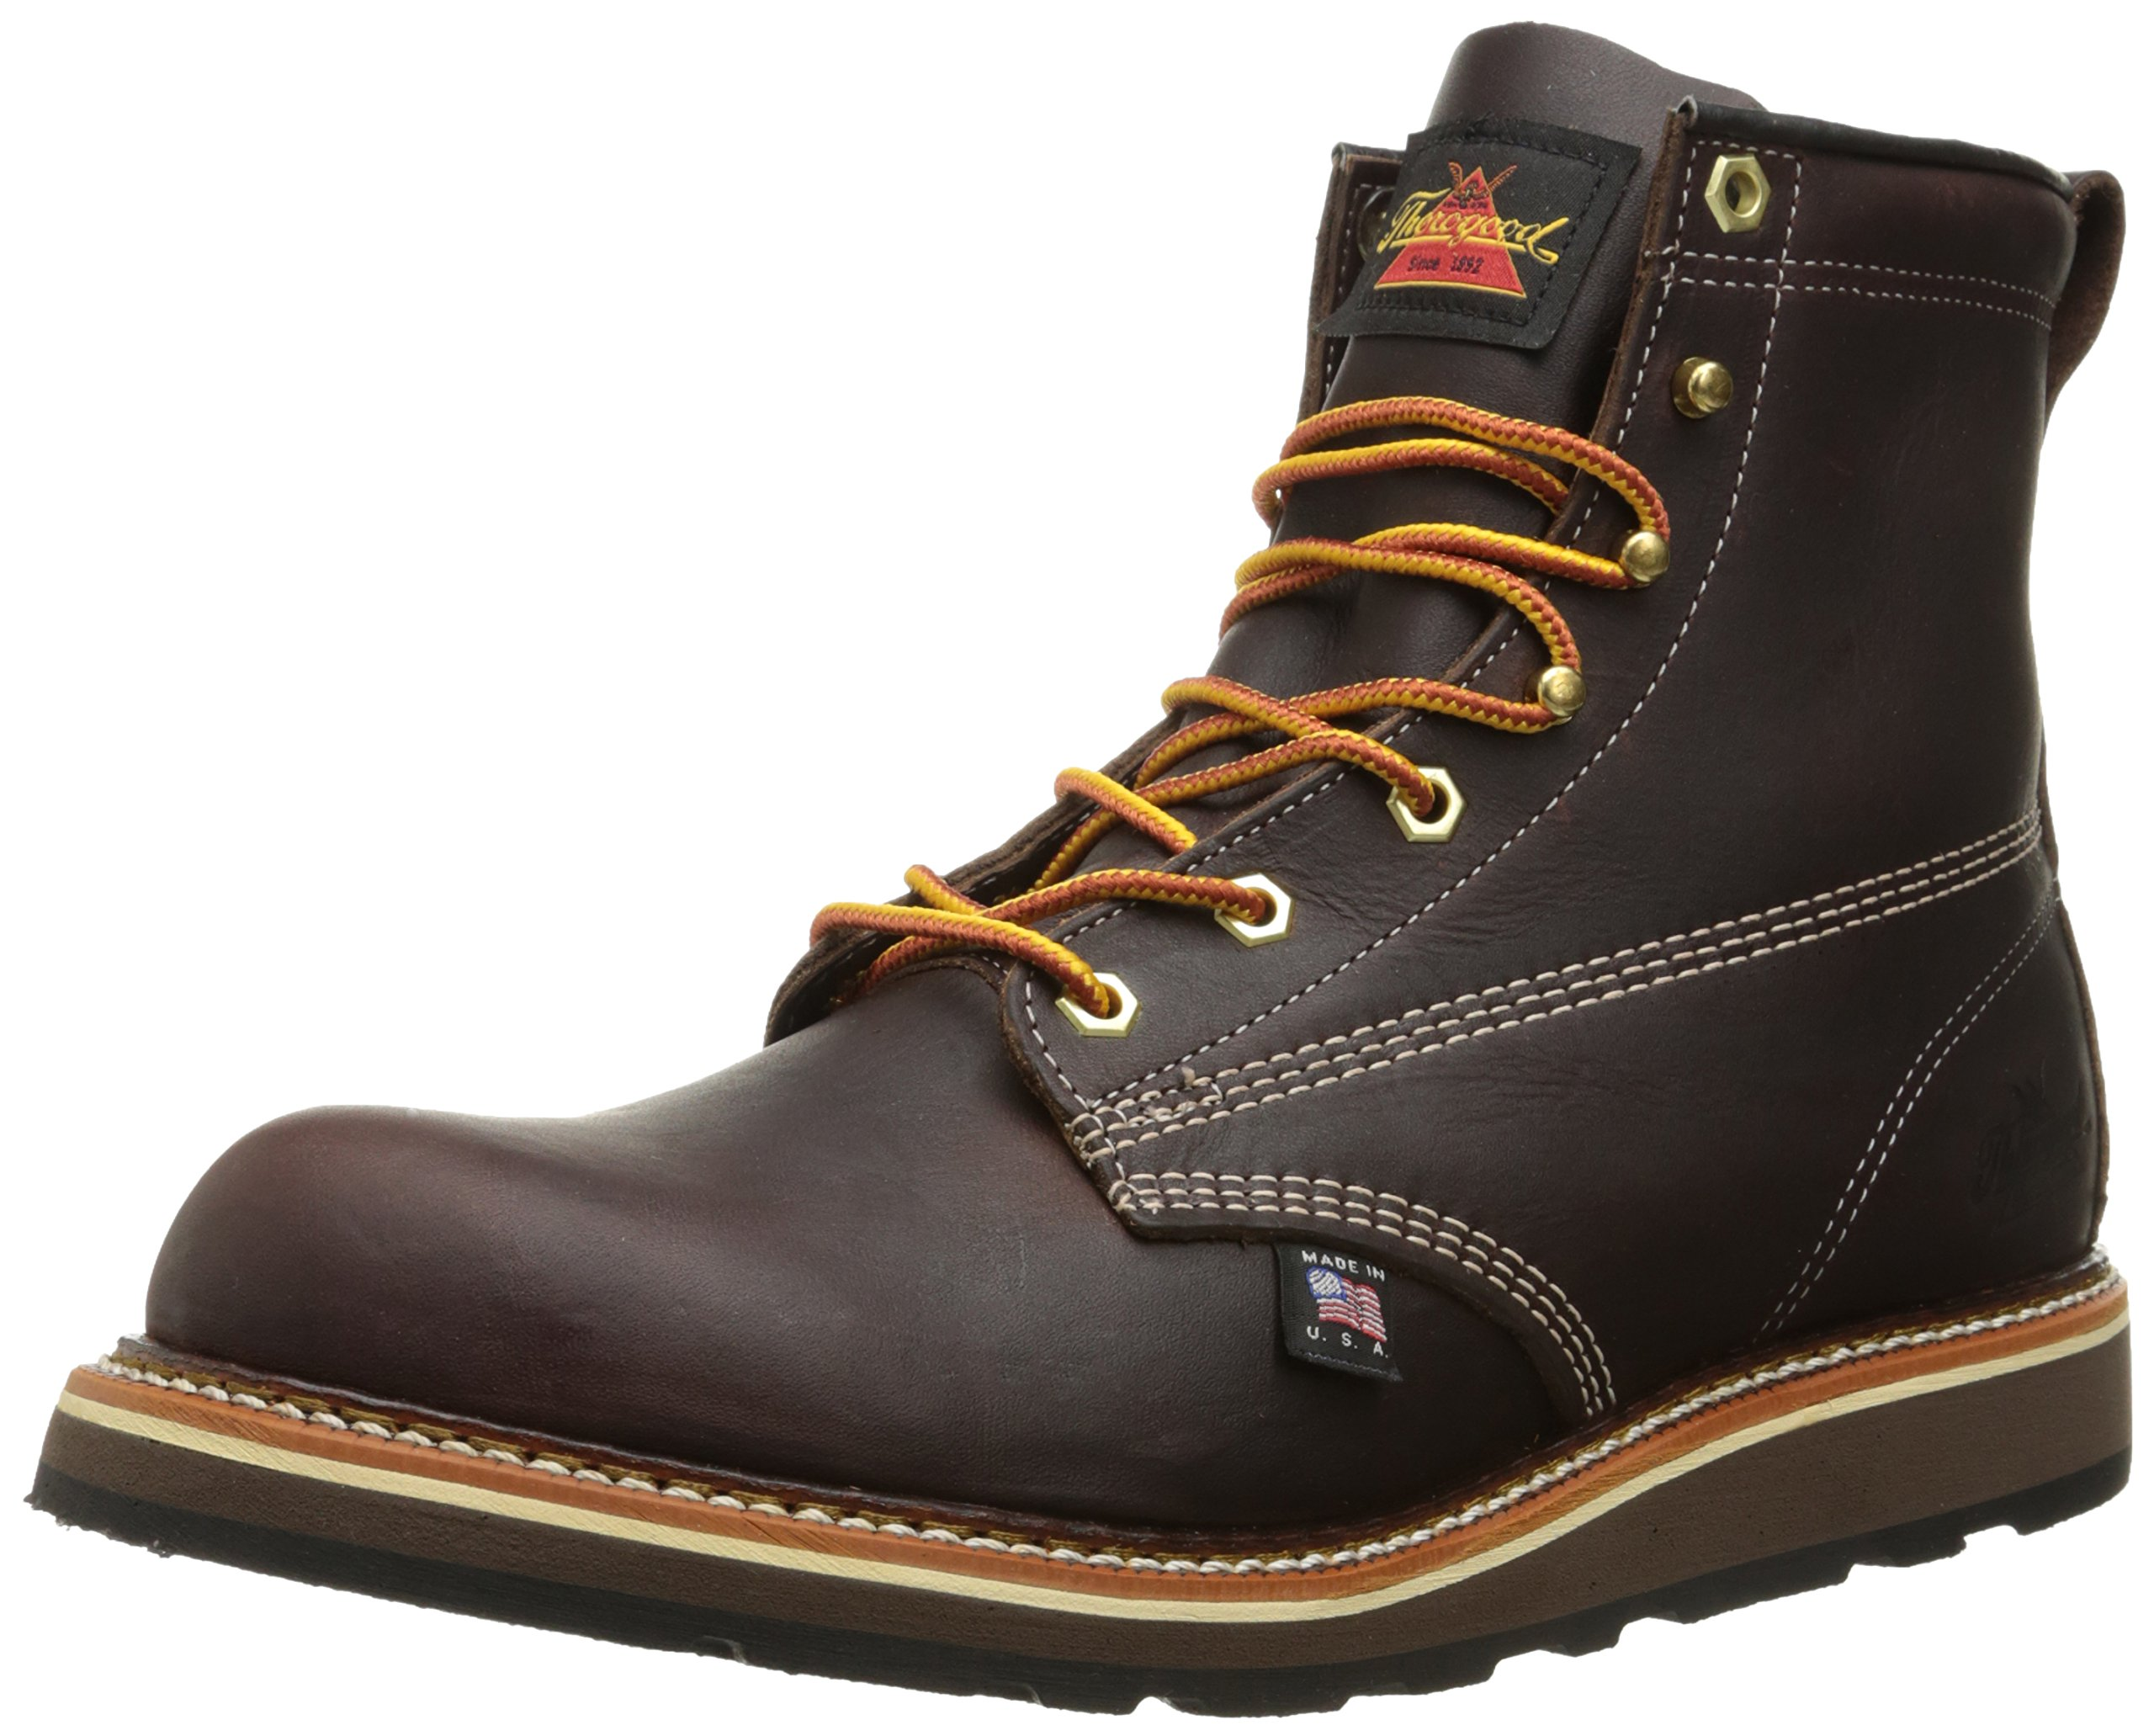 Thorogood American Heritage 6'' Plain Toe Rubber Boot, Walnut, 9.5 D US